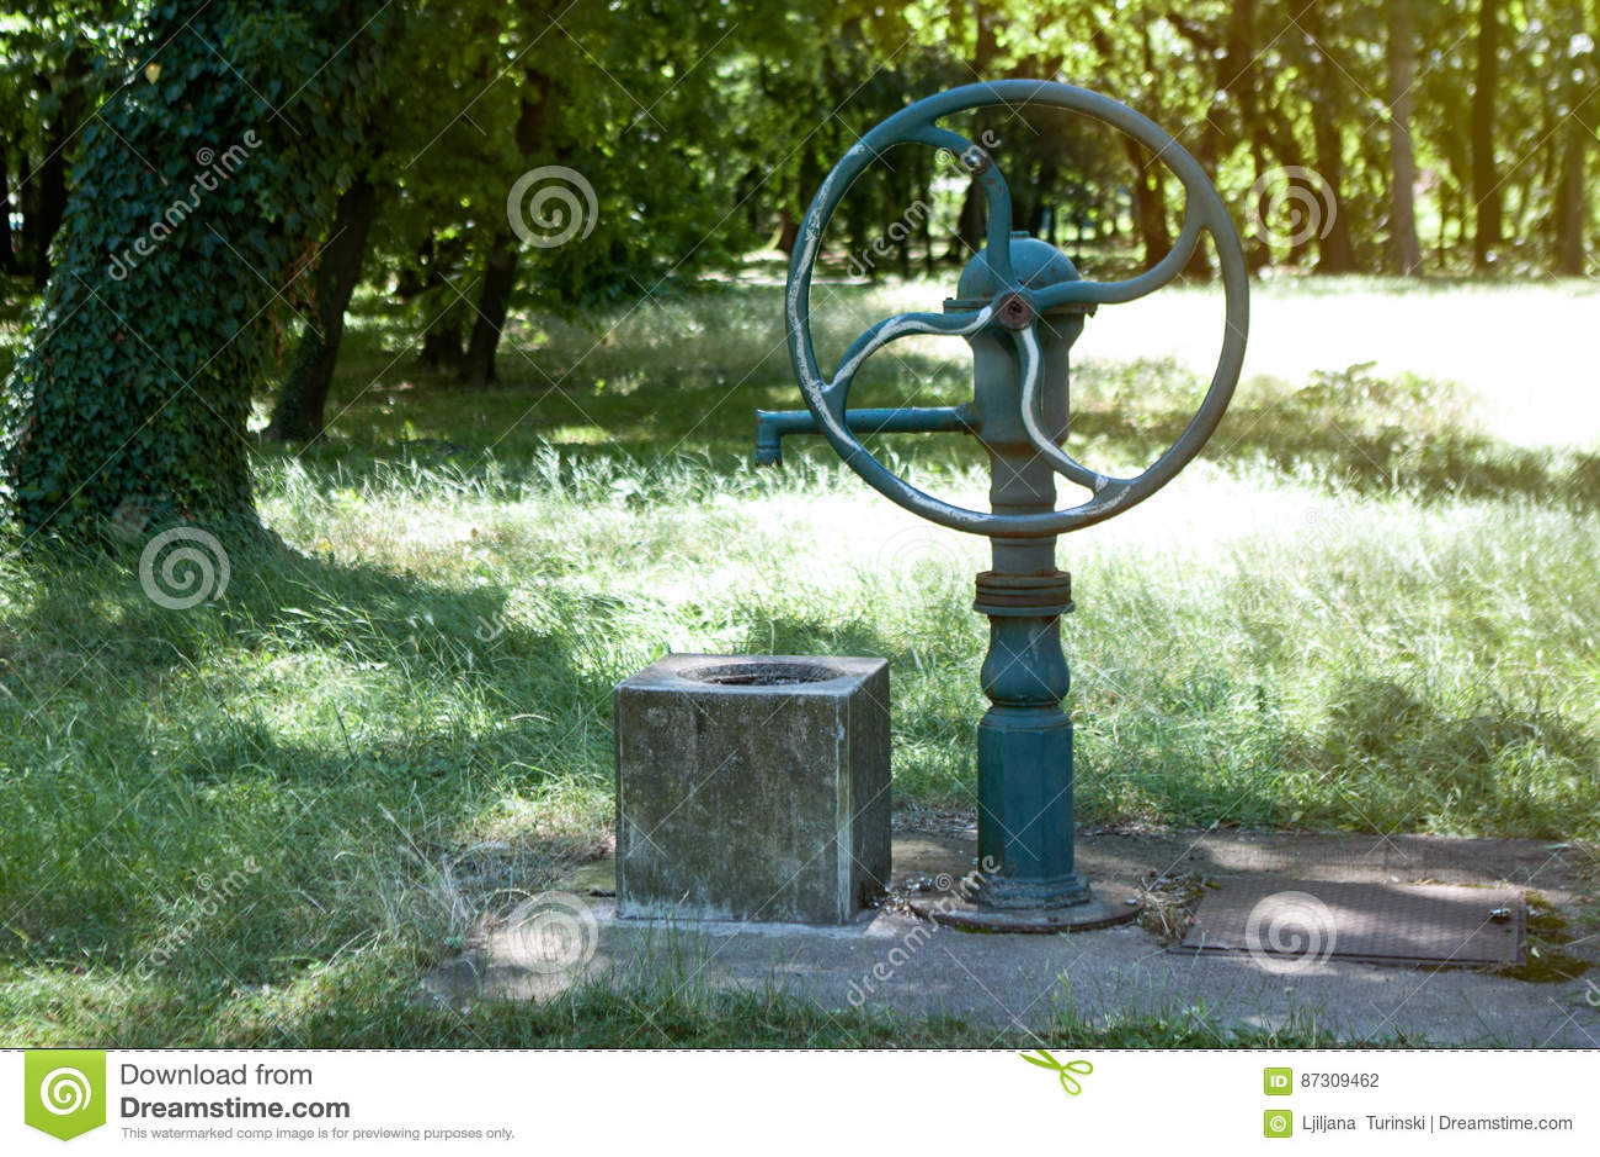 Verbazingwekkend Groene Oude Waterput En Pomp Voor Water Stock Foto - Afbeelding LP-26